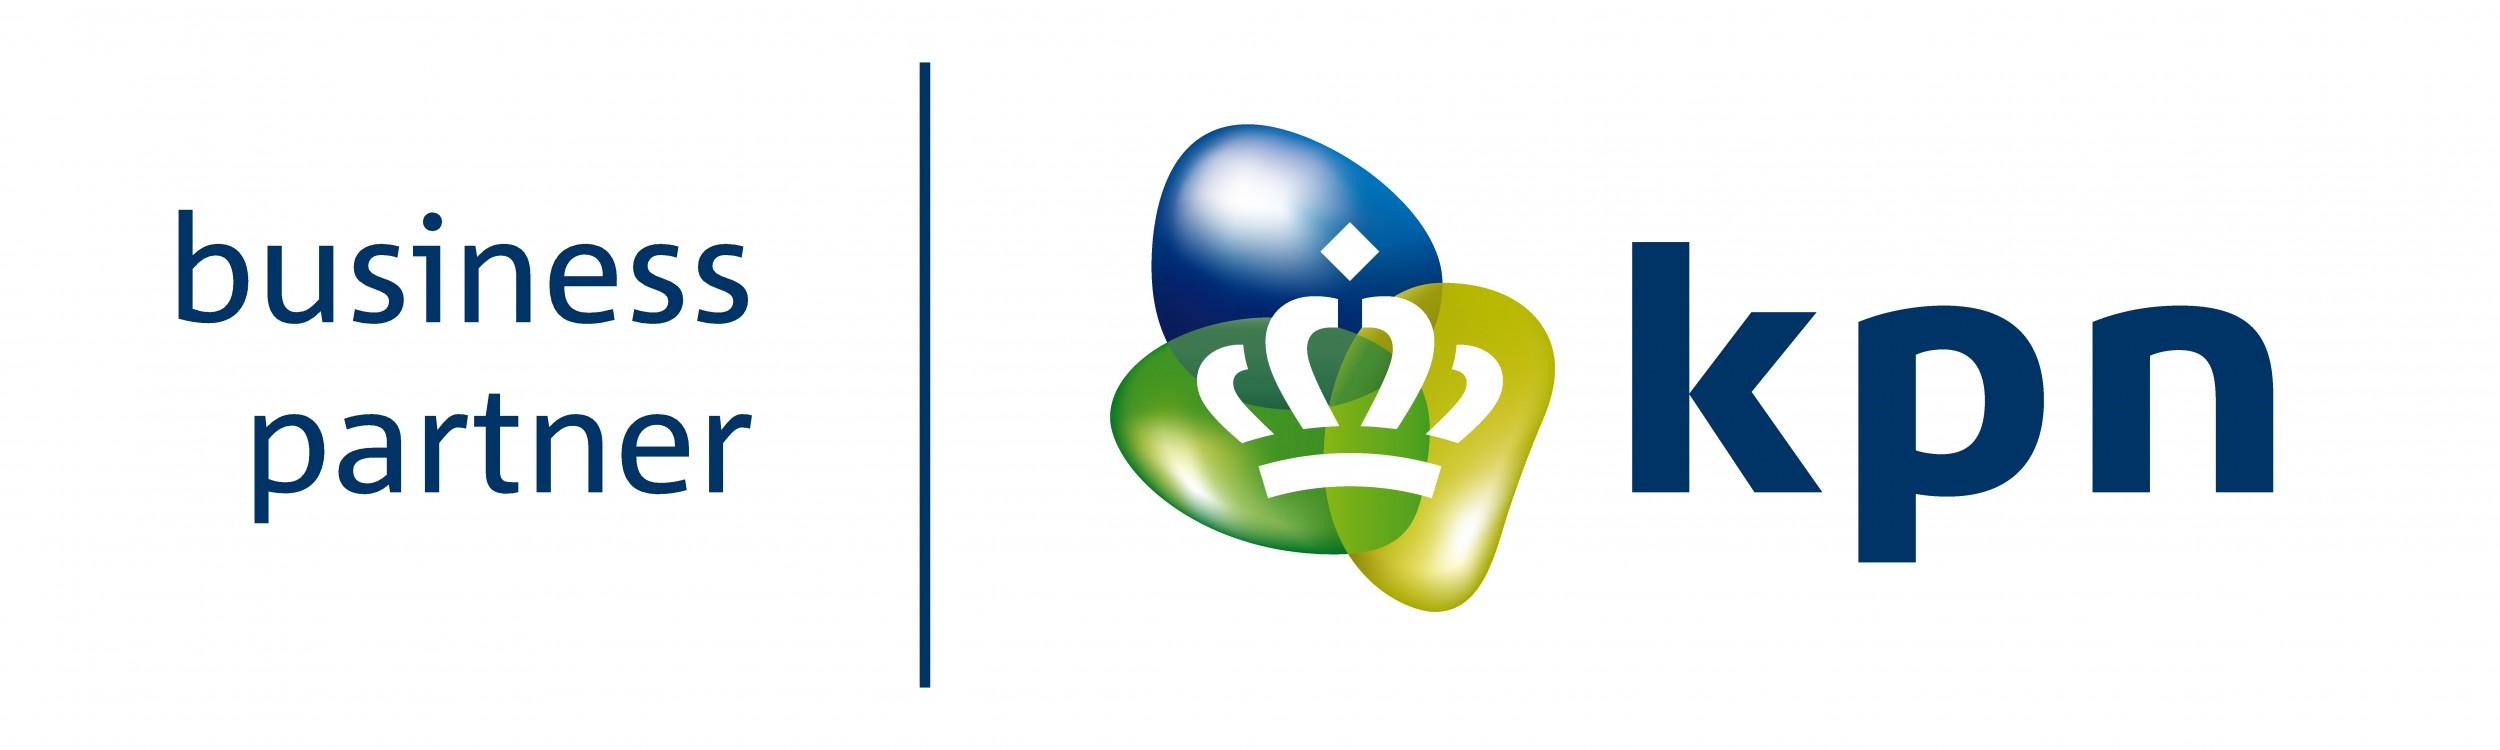 Company-Connect-Business-partner-e1368699144556